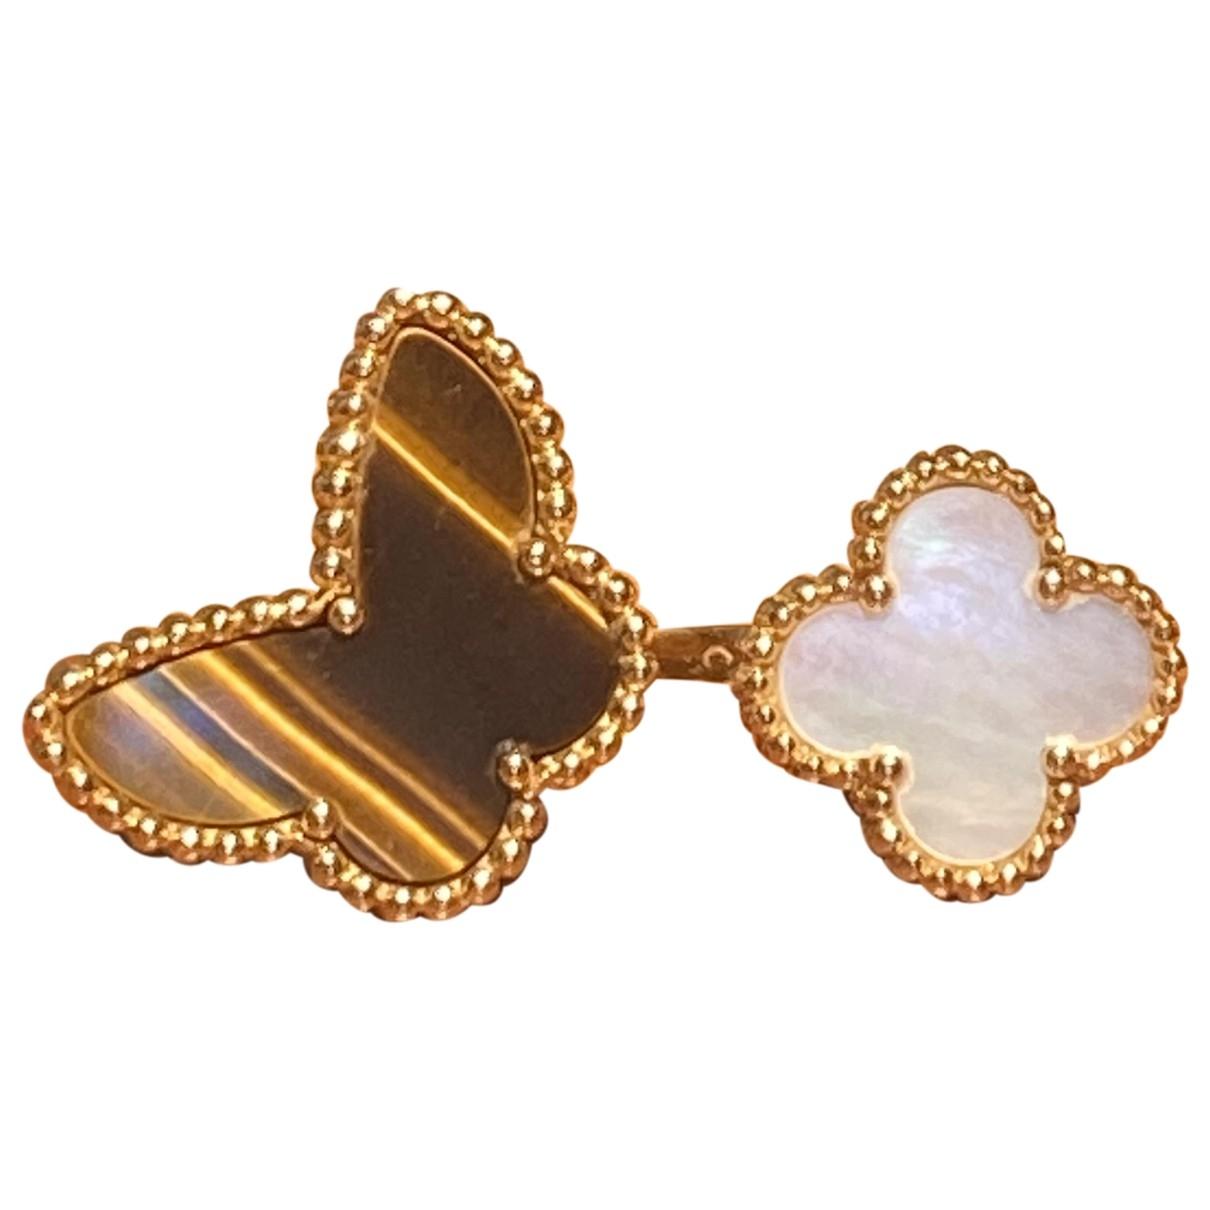 Van Cleef & Arpels - Bague Sweet Alhambra pour femme en or jaune - marron